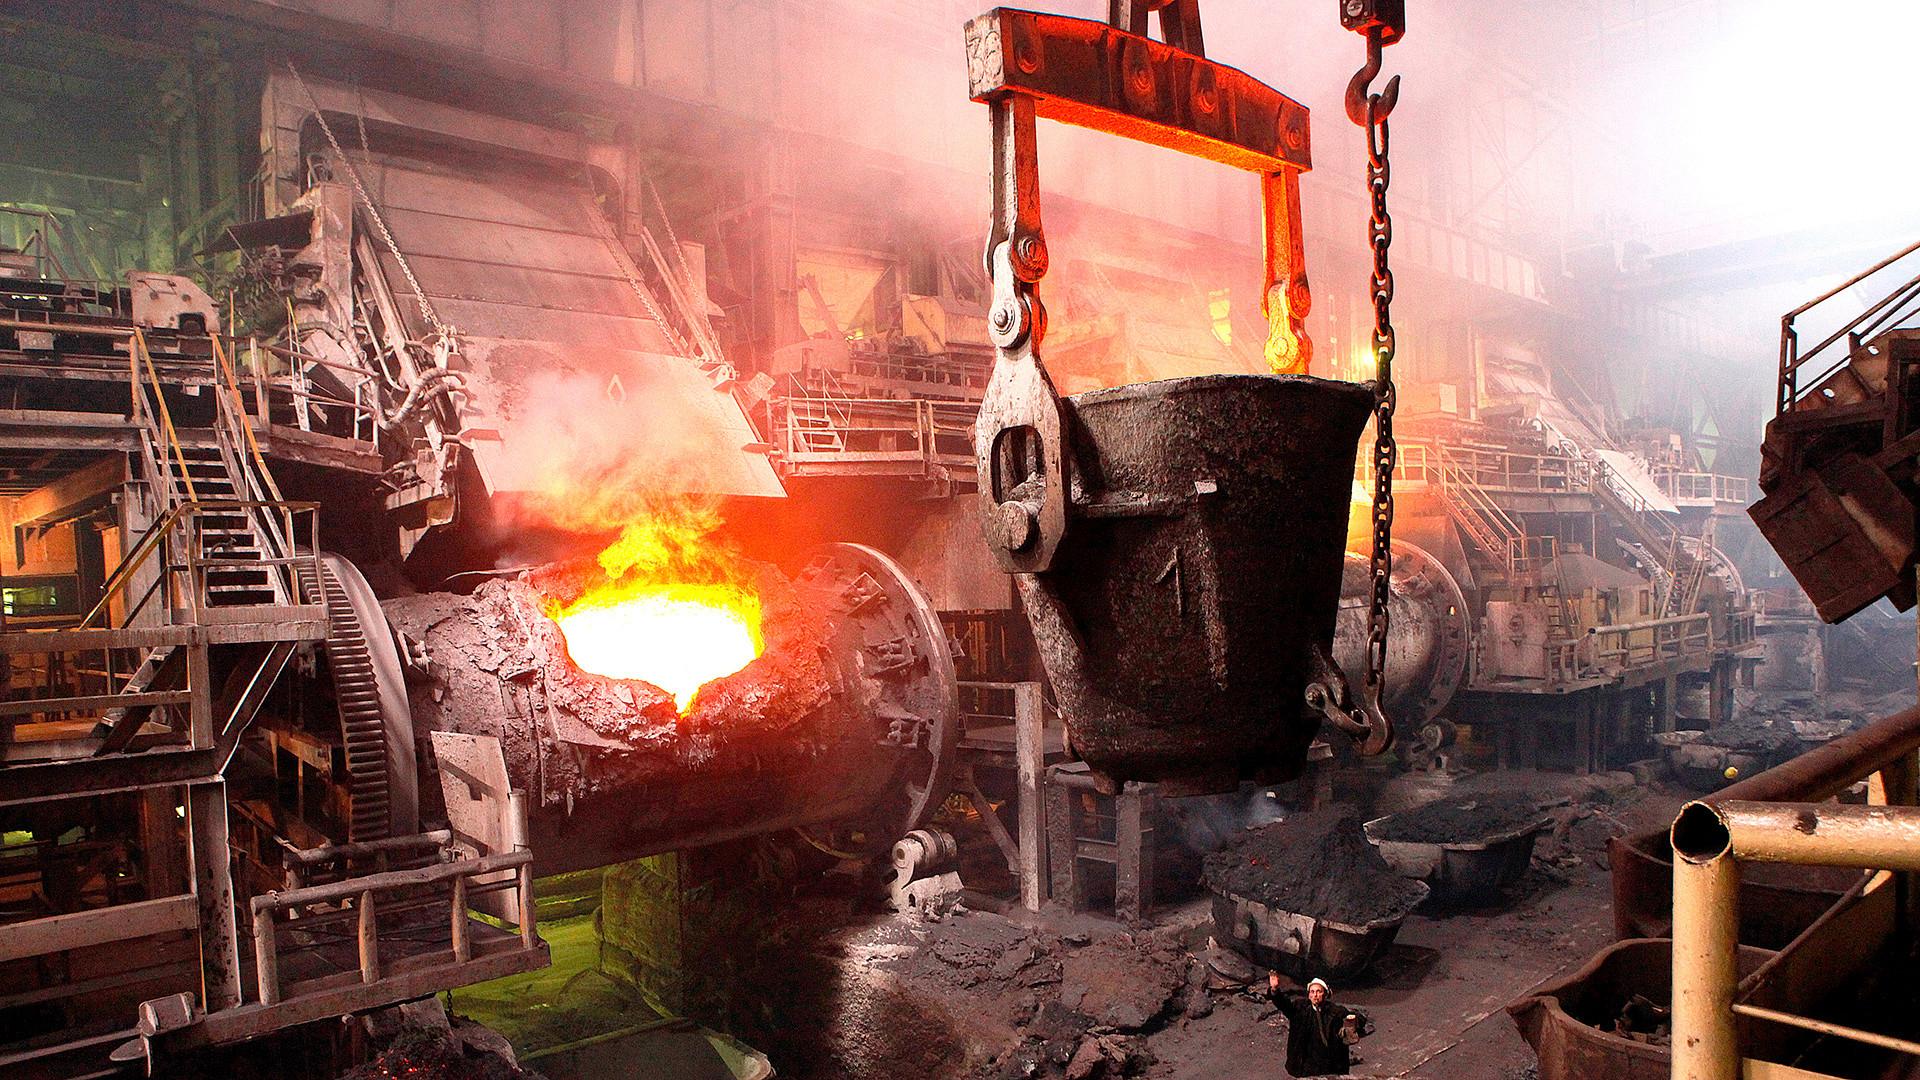 Kupferproduktion in Nischni Tagil